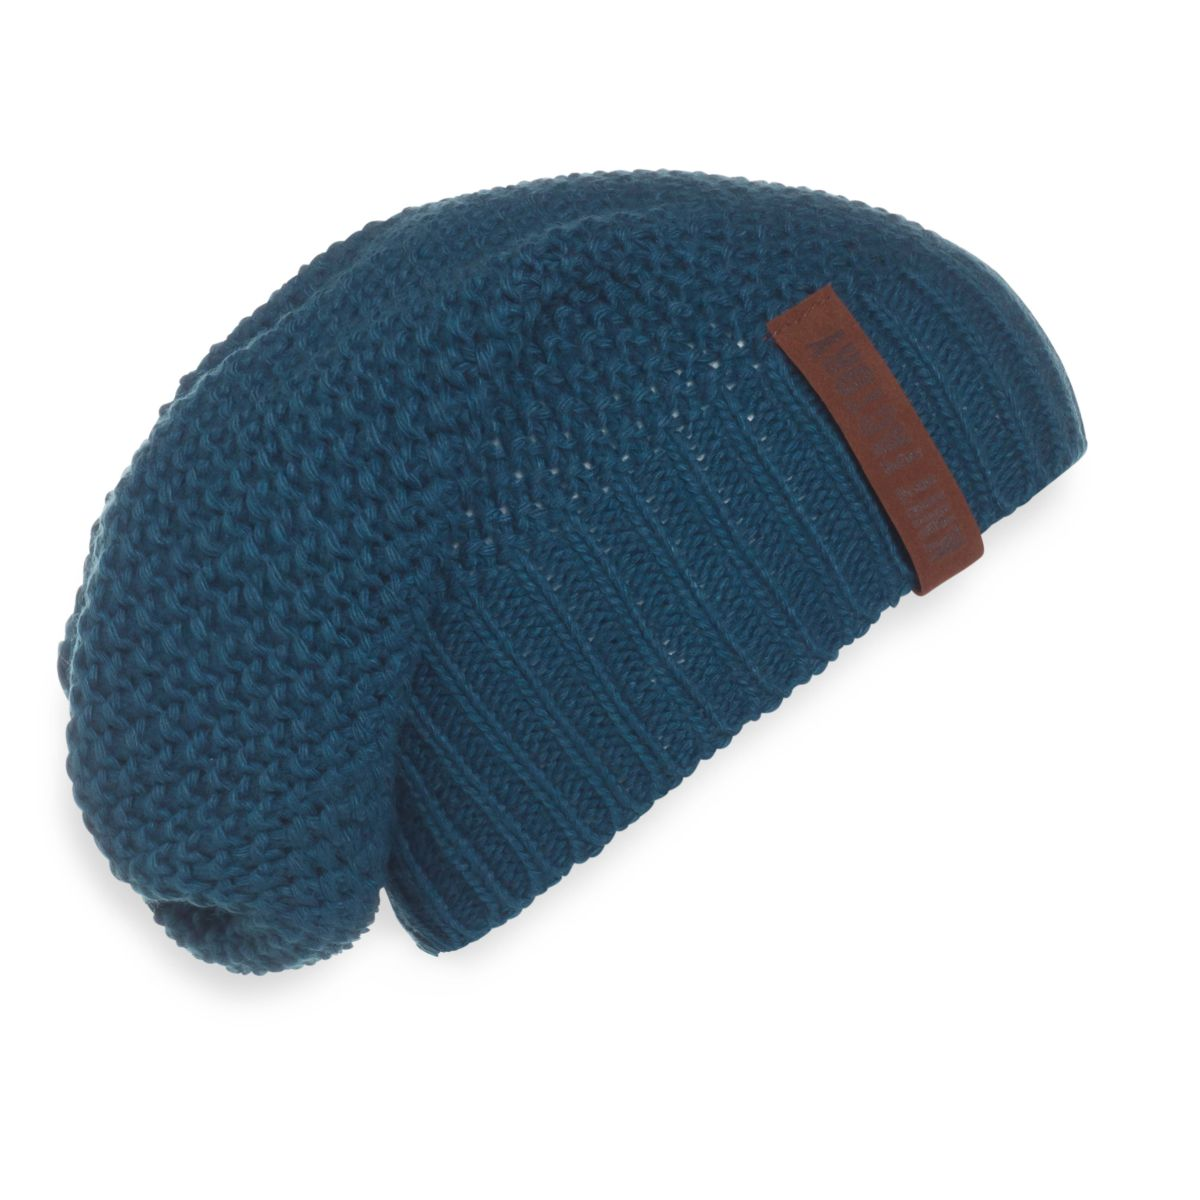 knit factory kf120070008 coco beanie petrol 1